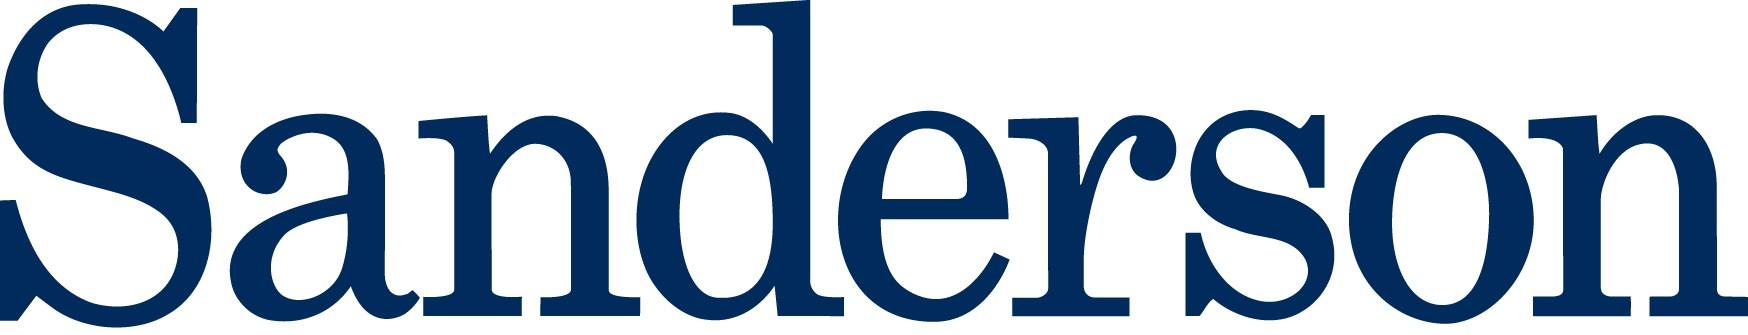 Sanderson-Logo-word-(blue)_1